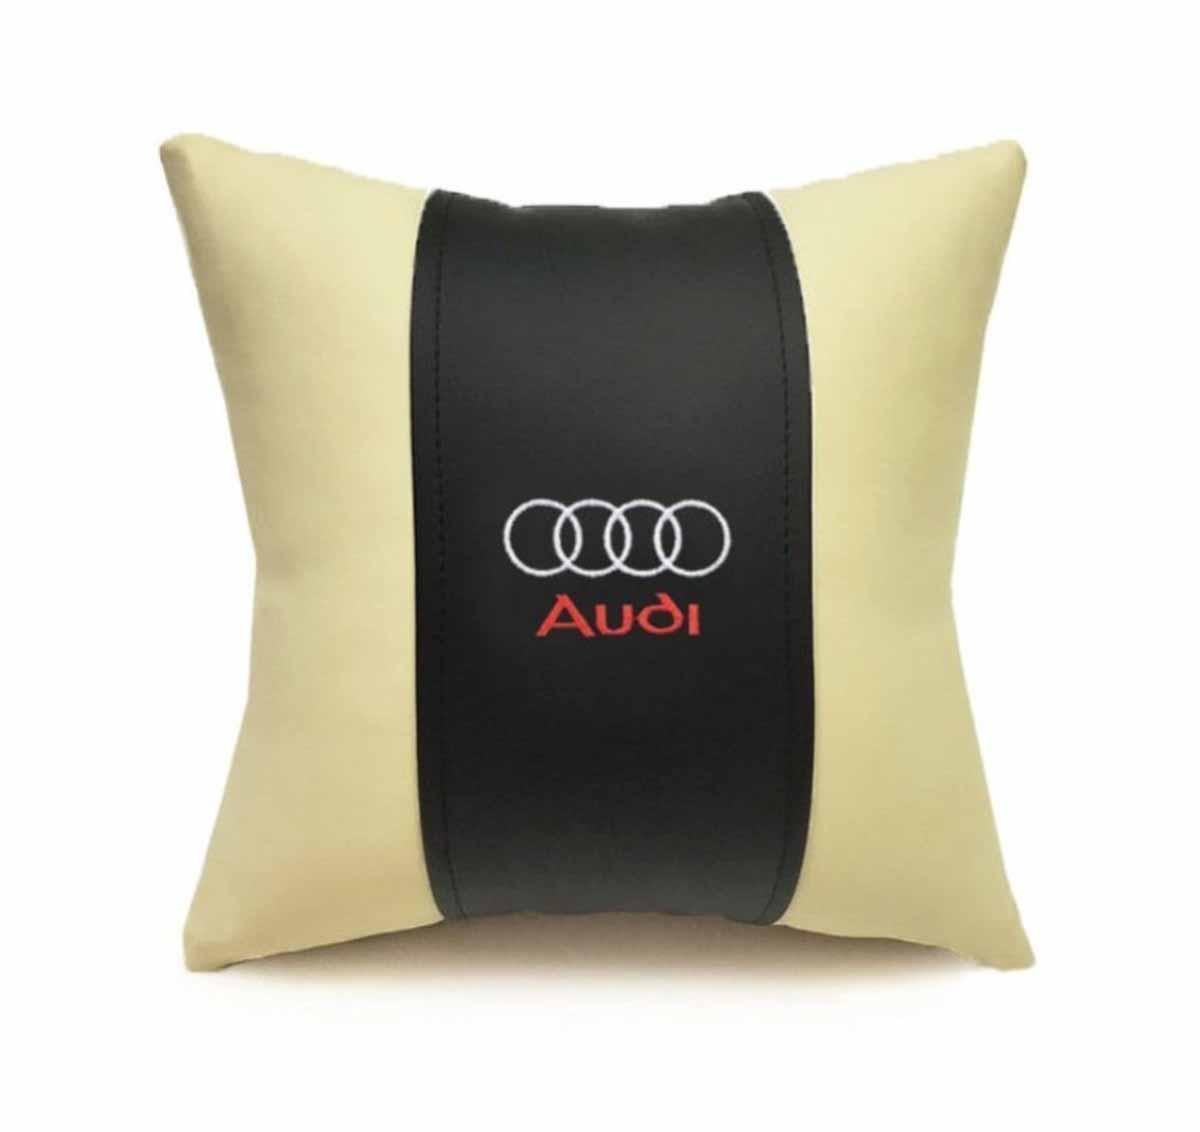 "Подушка декоративная Auto premium ""AUDI"", цвет: черно-бежевый. 37040"